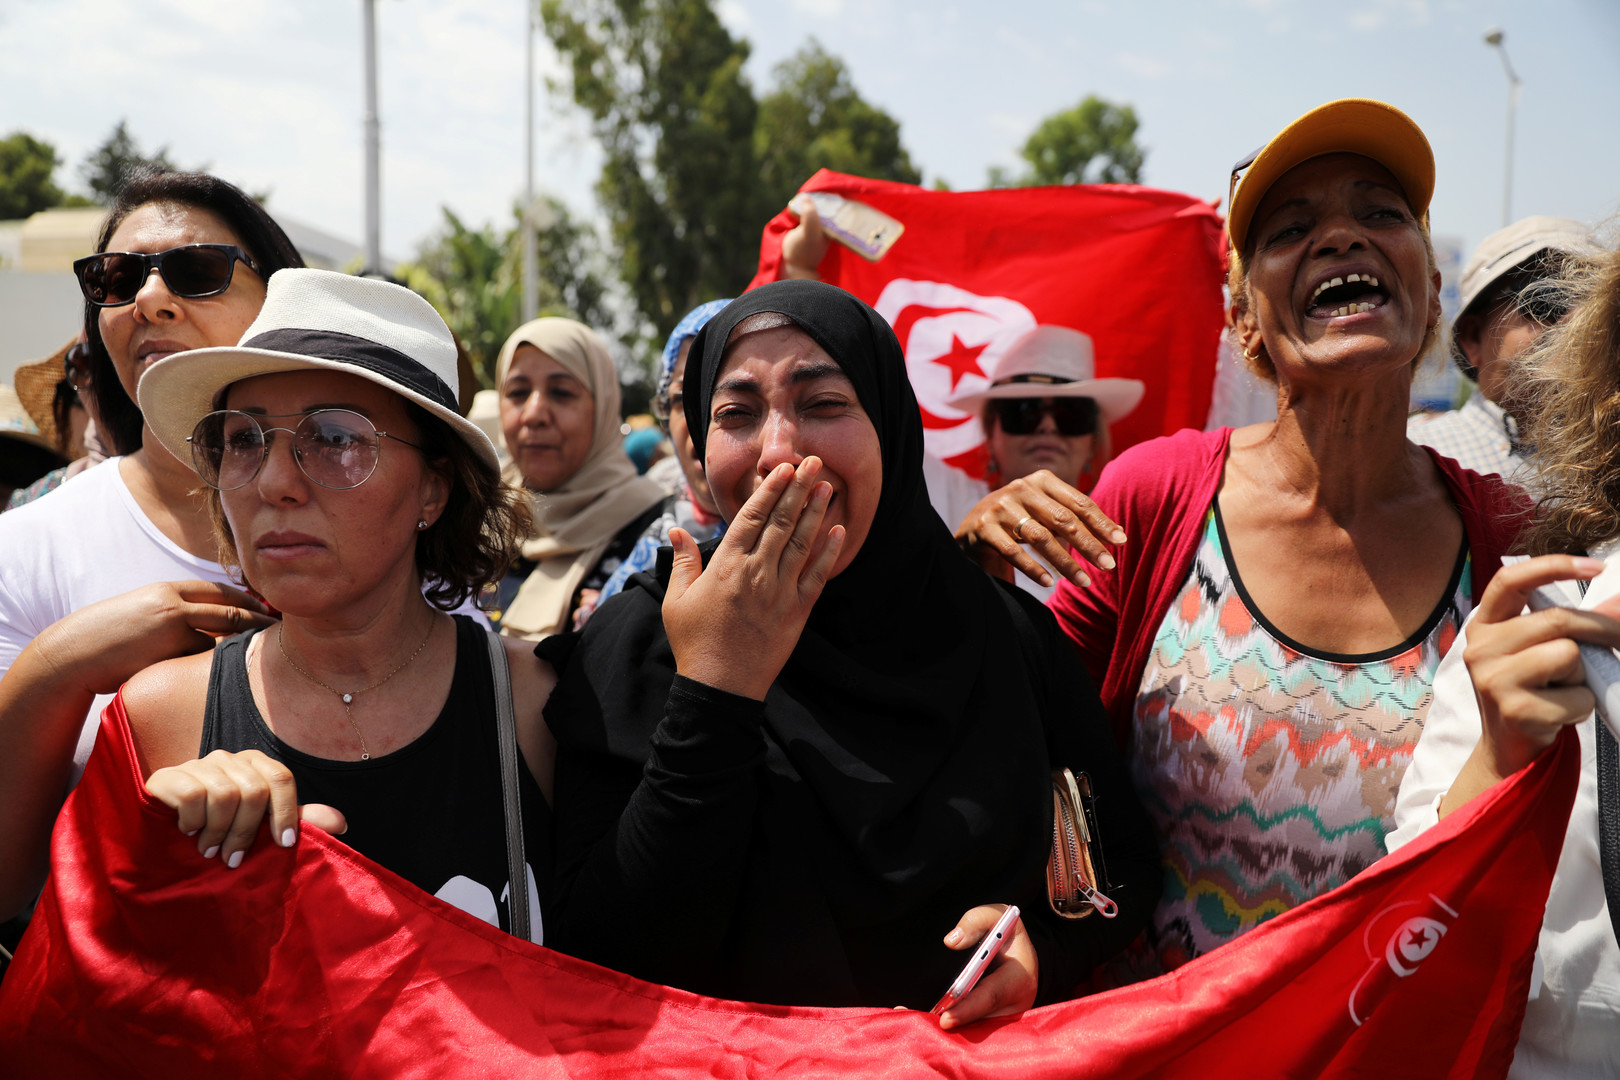 تونسیهكان به چاوی پڕ له فرمێسكهوه ماڵئاوایان له سهرۆكهكهیان كرد